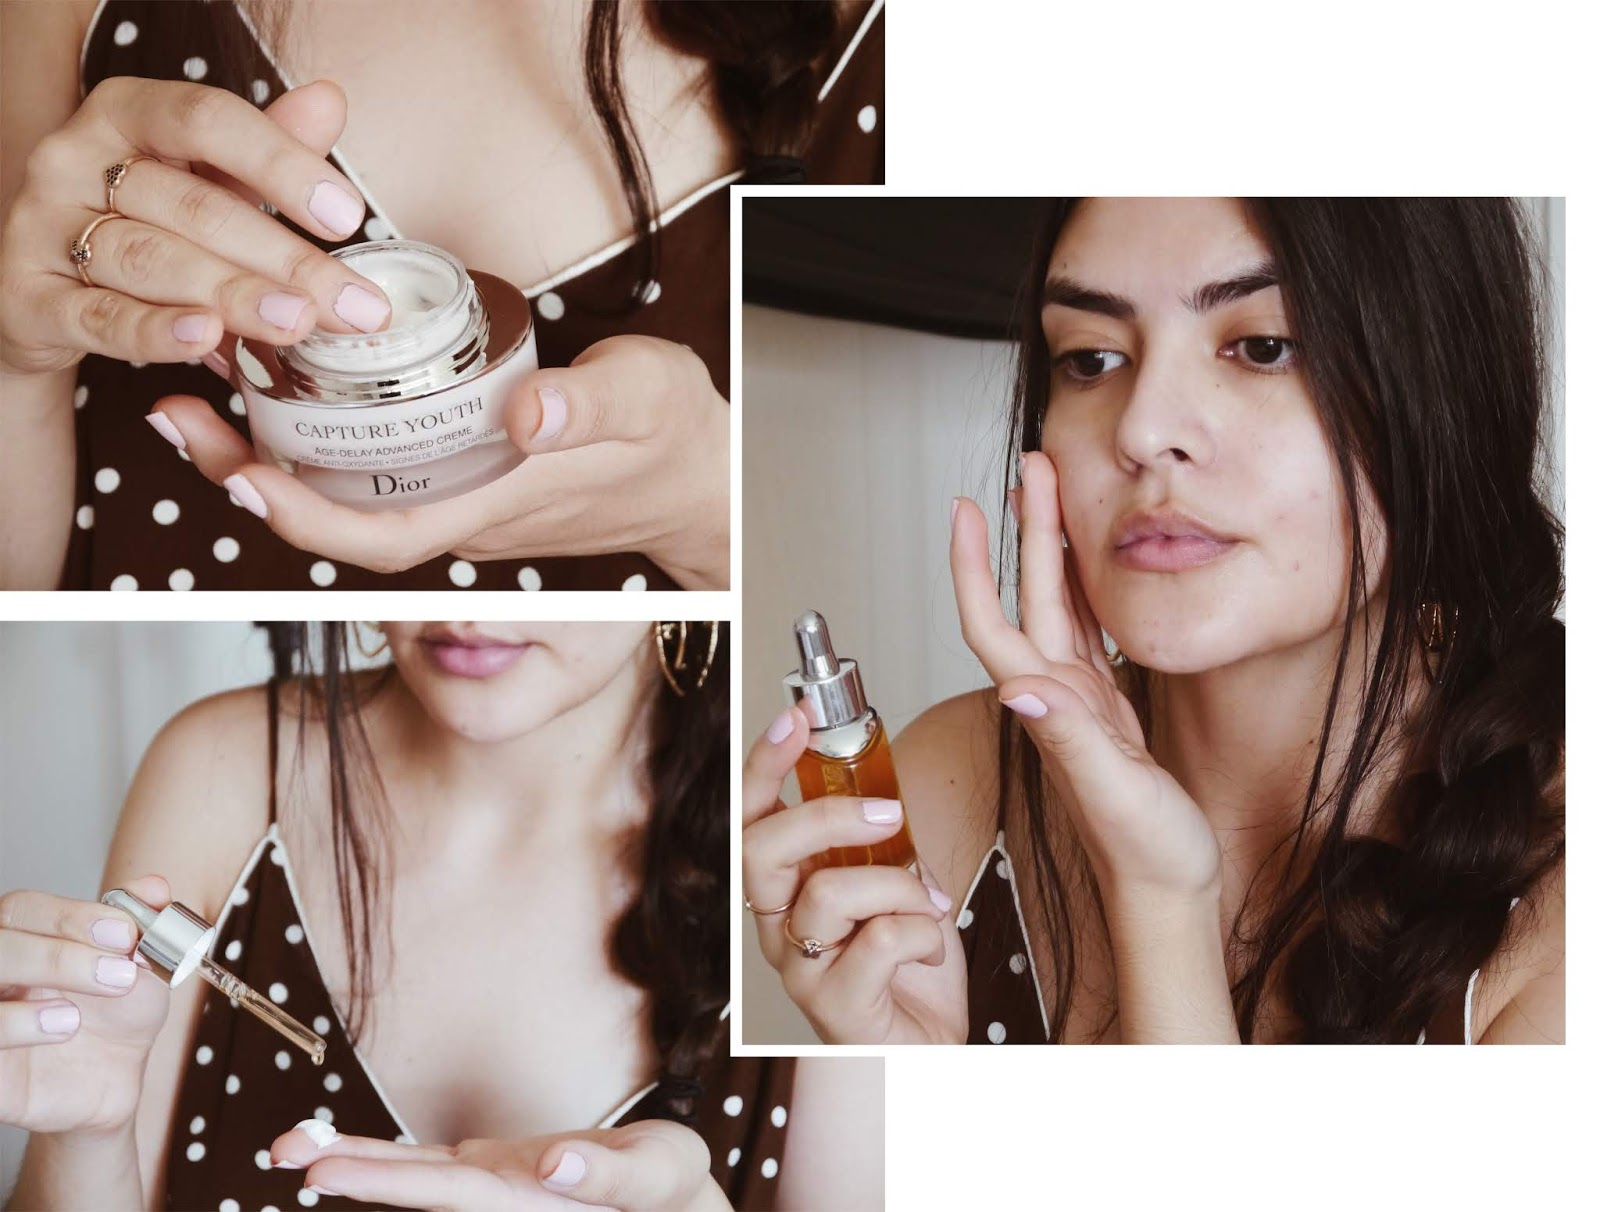 dior capture youth creme serum lift sculpt plump skincare beauty blogger mexicana belleza cuidado de piel mexico makeup 4